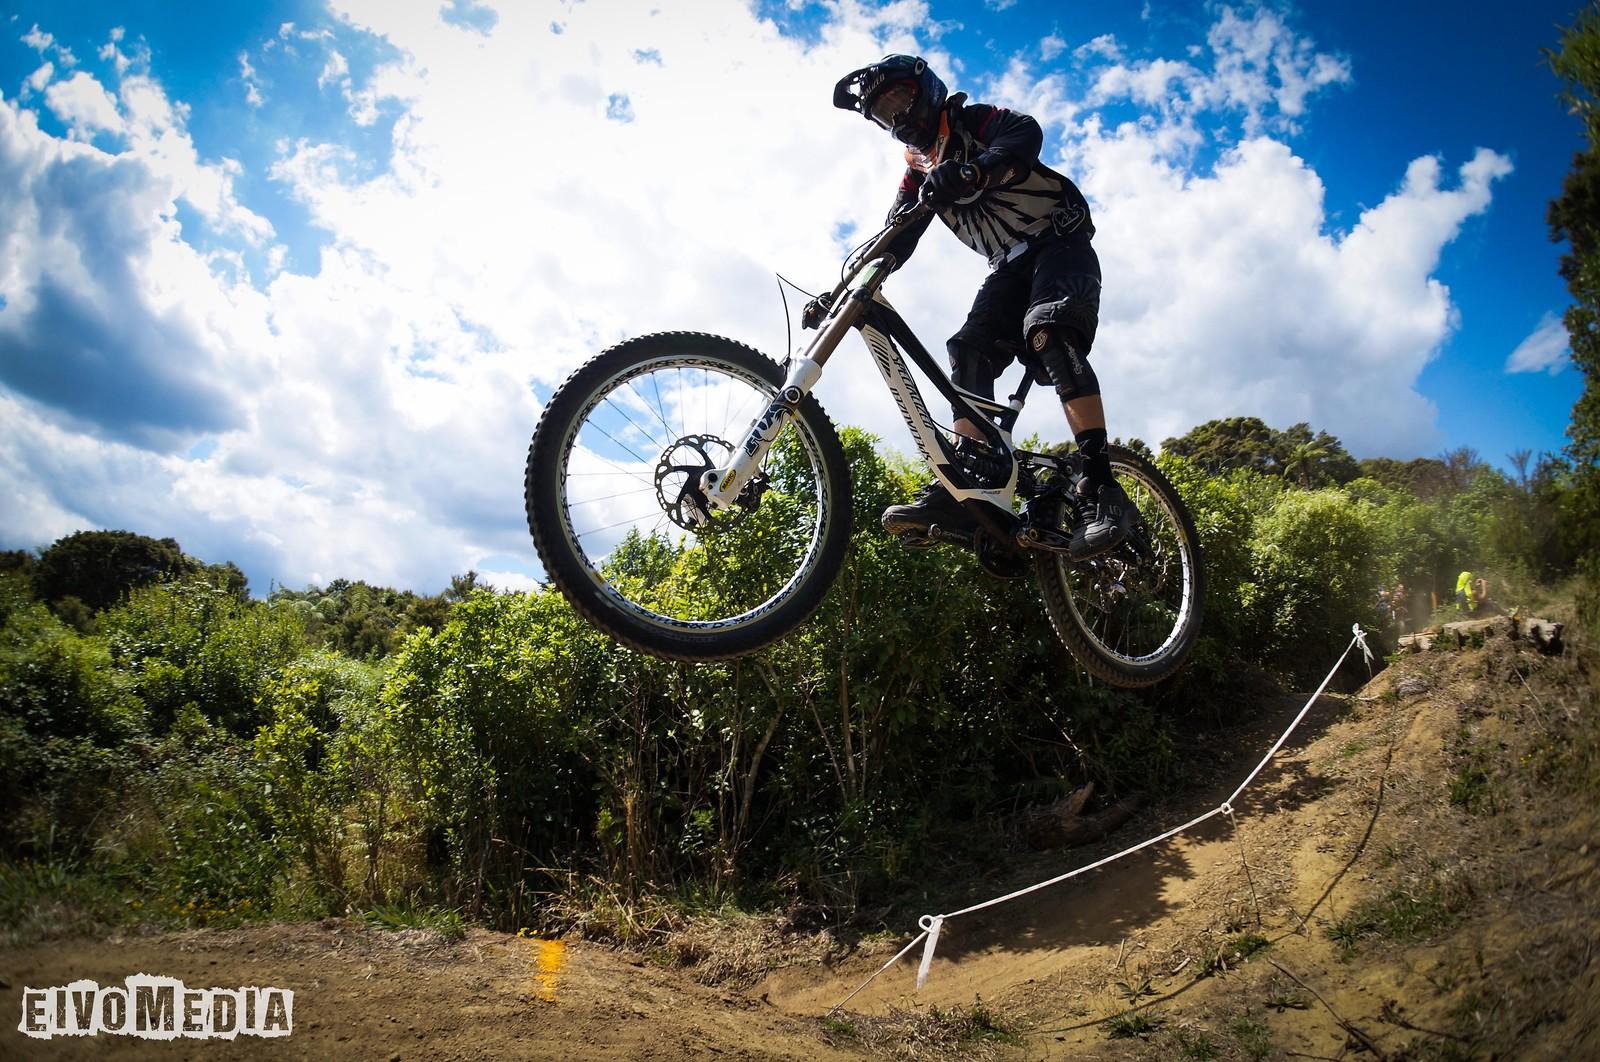 Hunua DH-5 - EIVOMEDIA - Mountain Biking Pictures - Vital MTB